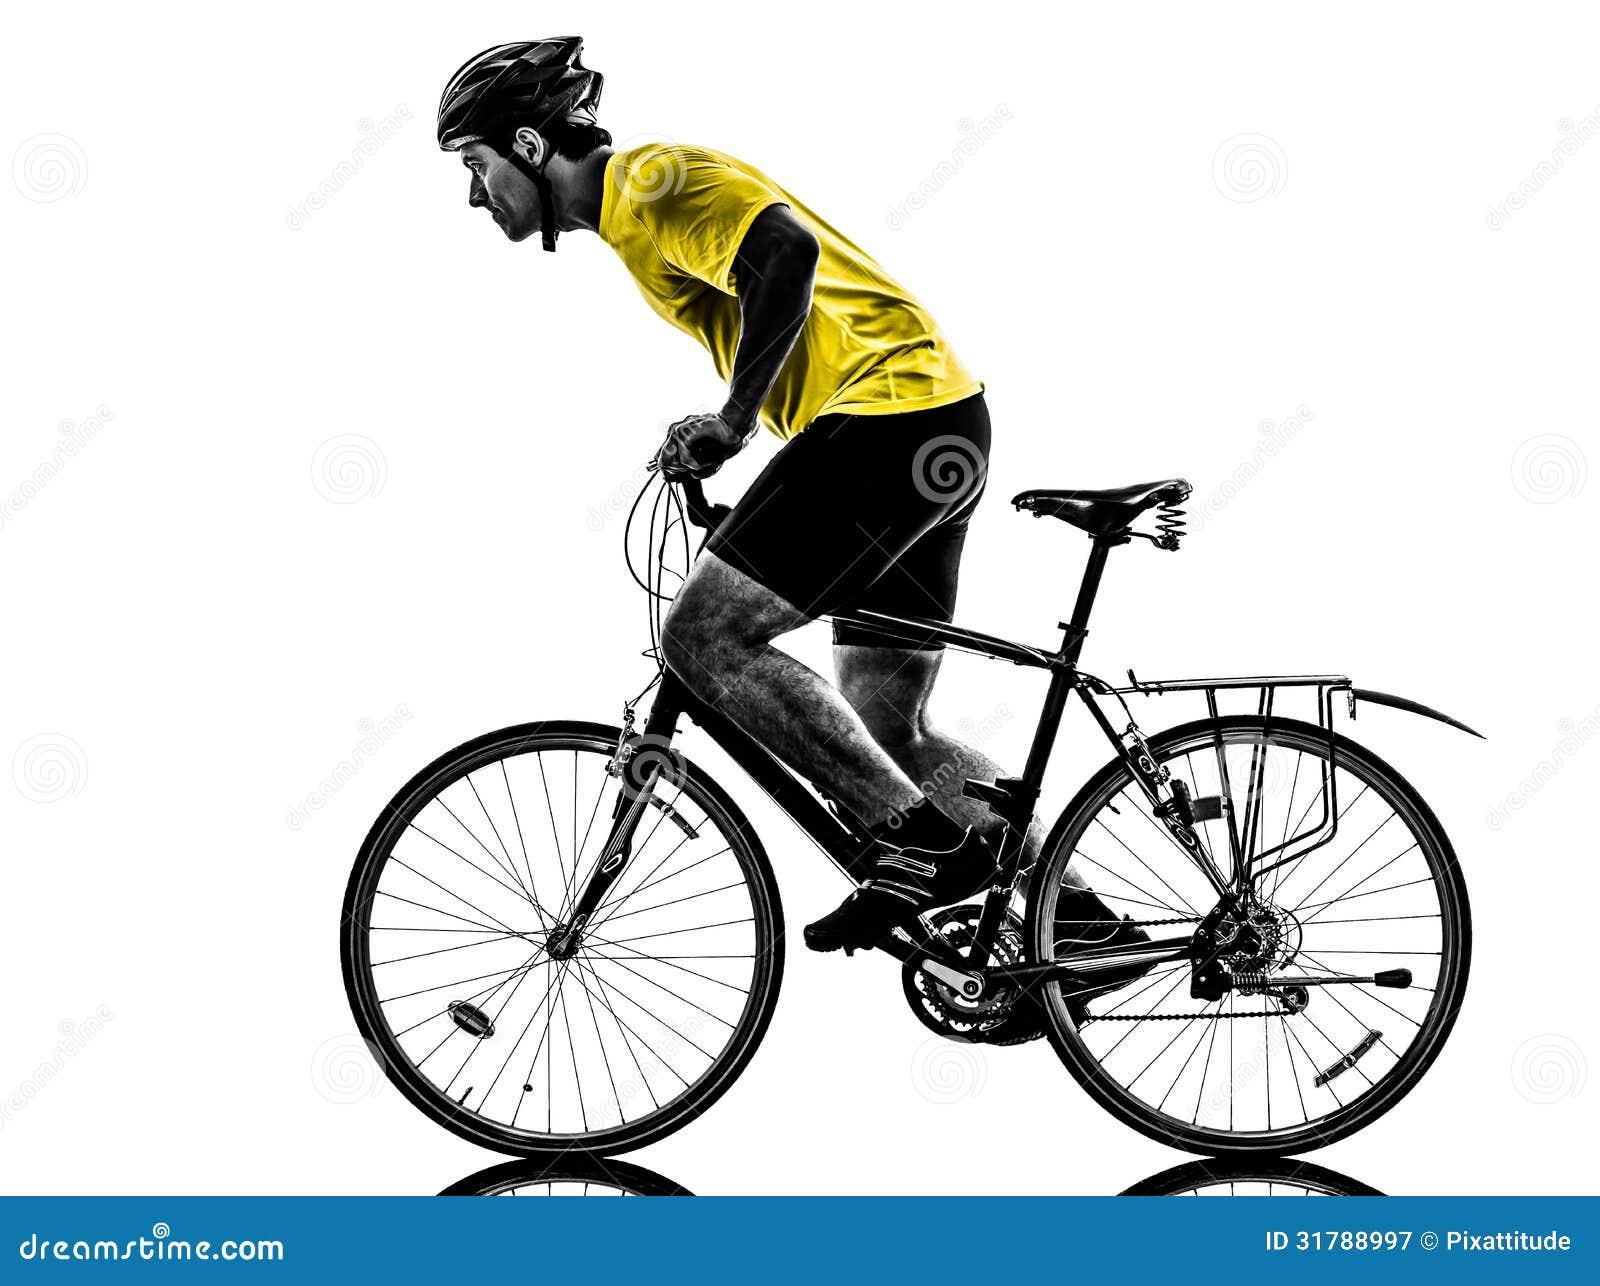 Man Bicycling Mountain Bike Silhouette Royalty Free Stock